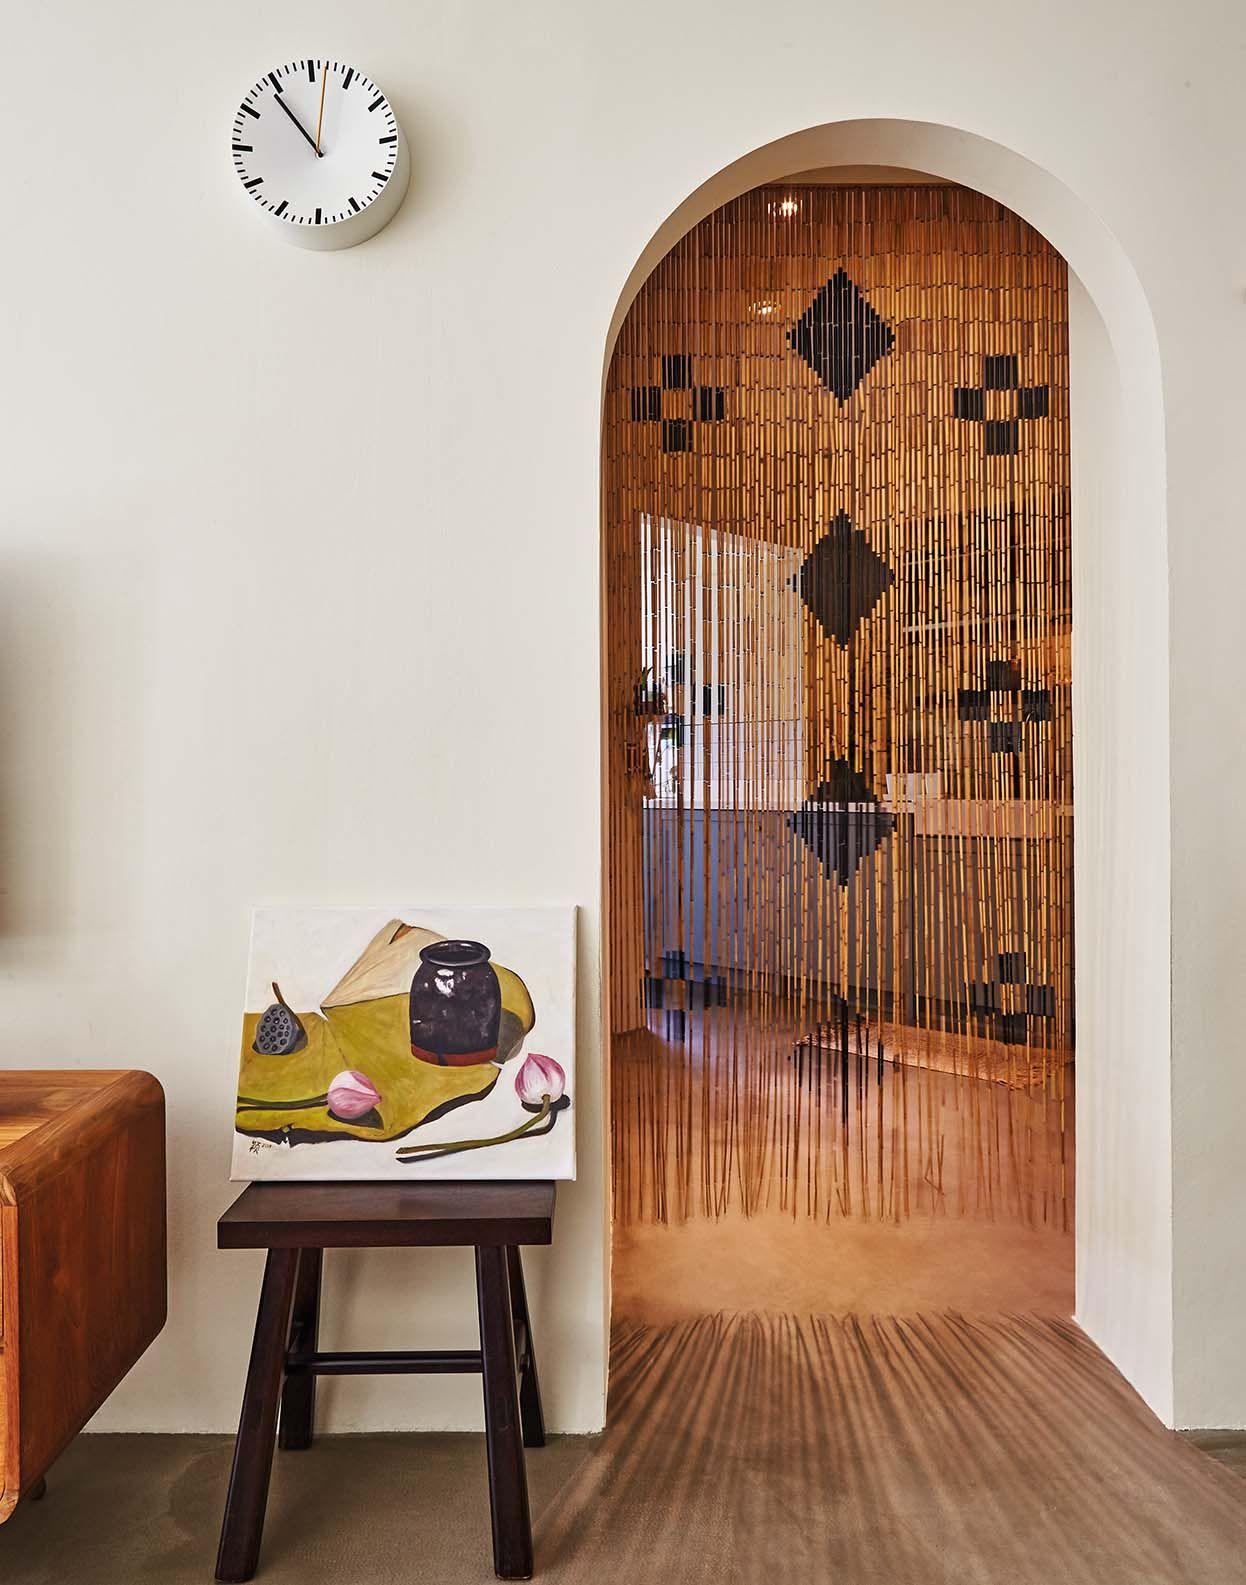 Bedroom Hdb Furniture: Pin On Amazing Singaporean Homes